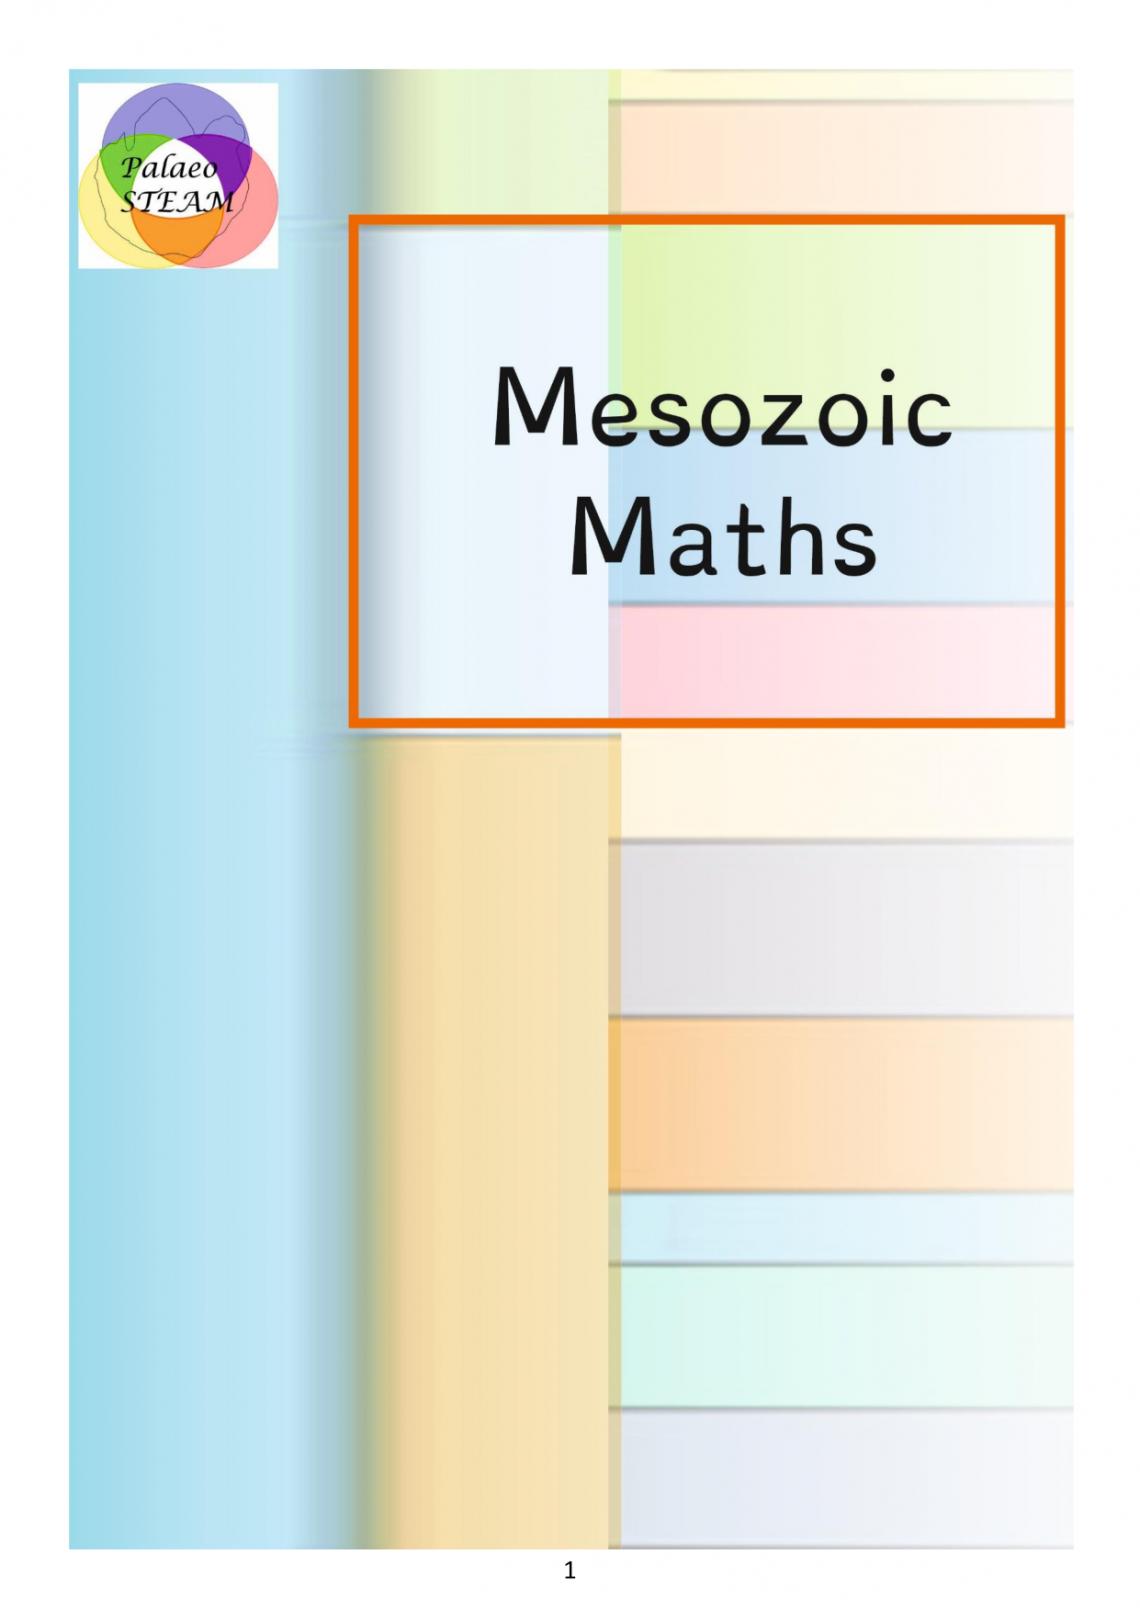 Mesozoic Maths